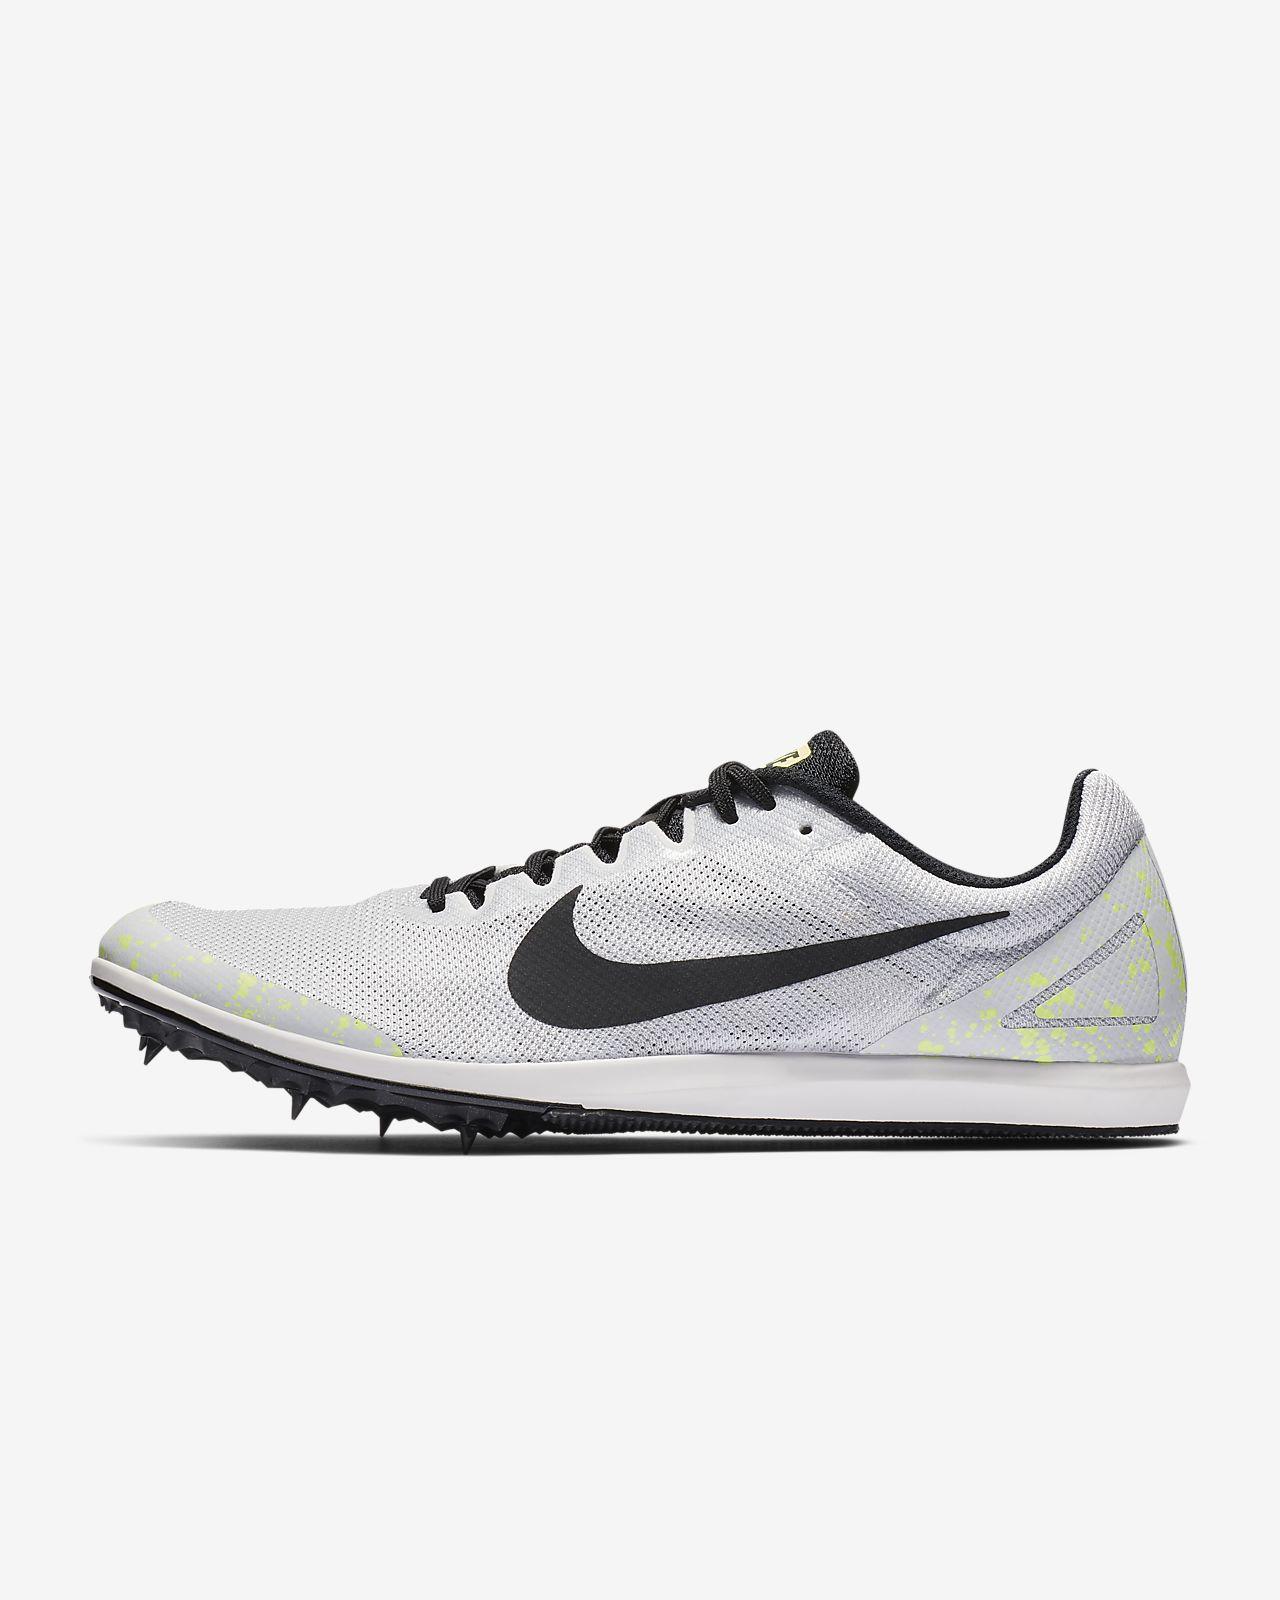 e803a487f6a9c Chaussure de course à pointes mixte Nike Zoom Rival D 10. Nike.com FR